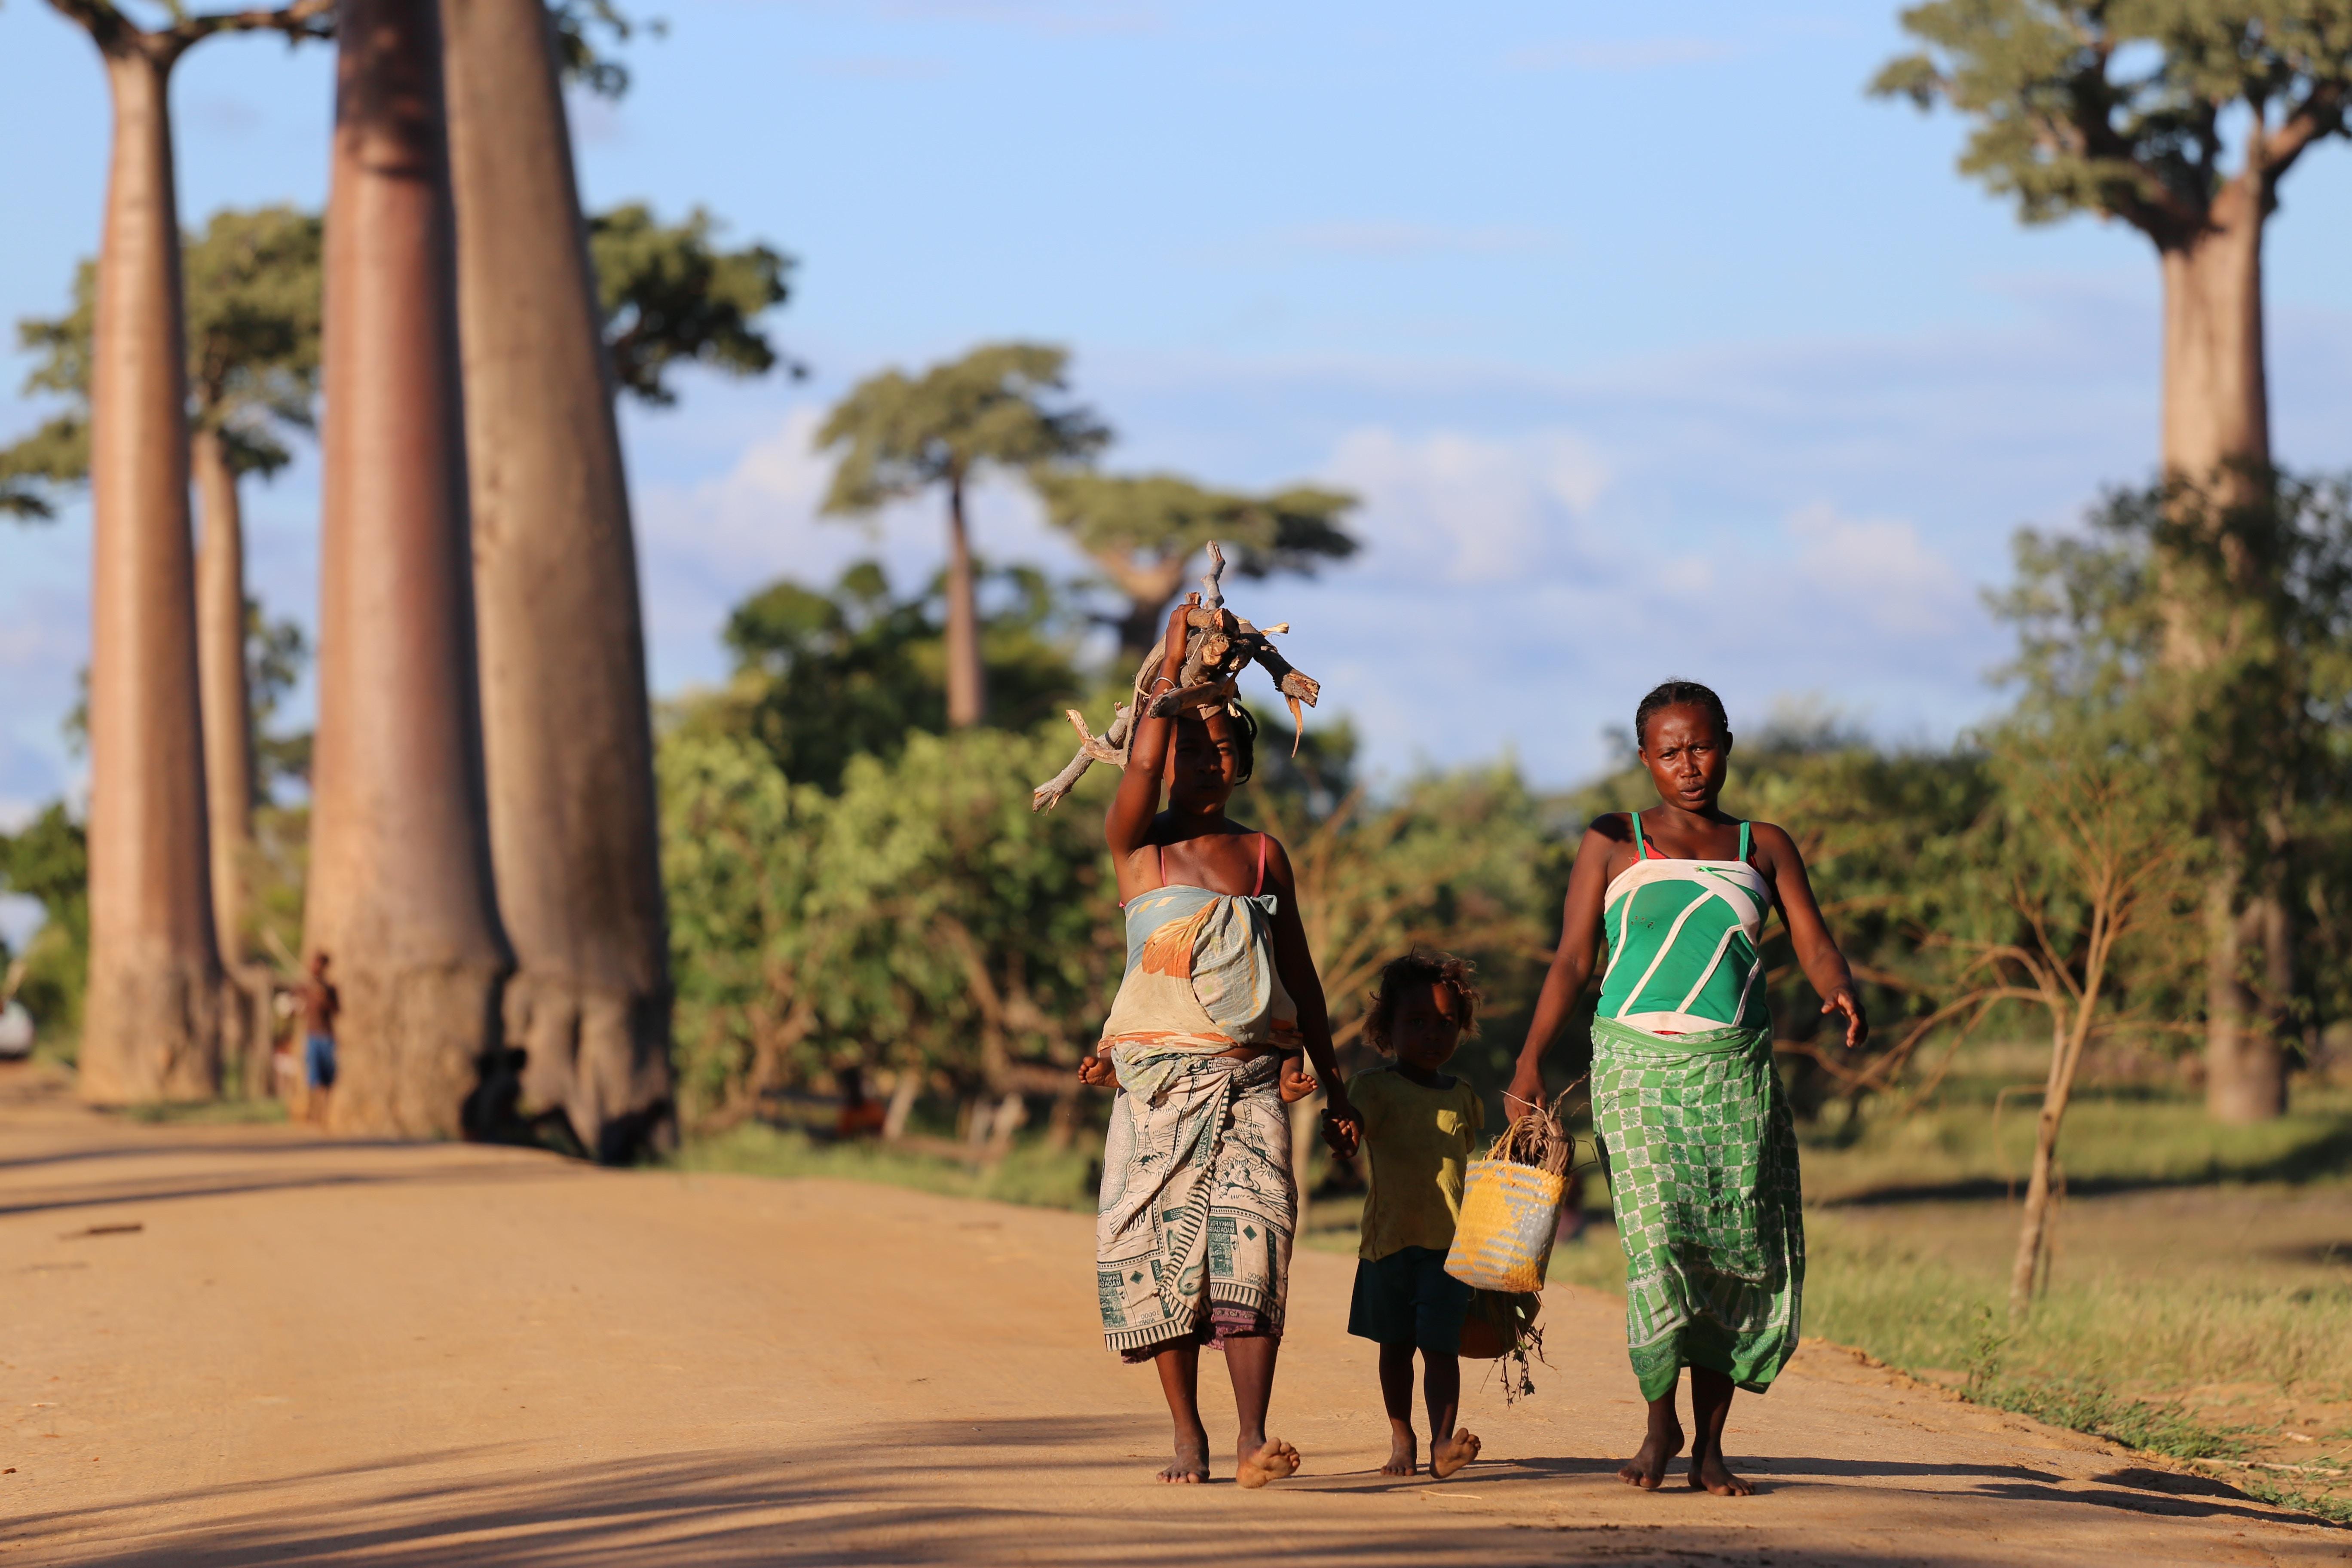 Nigeria outranks India in poverty